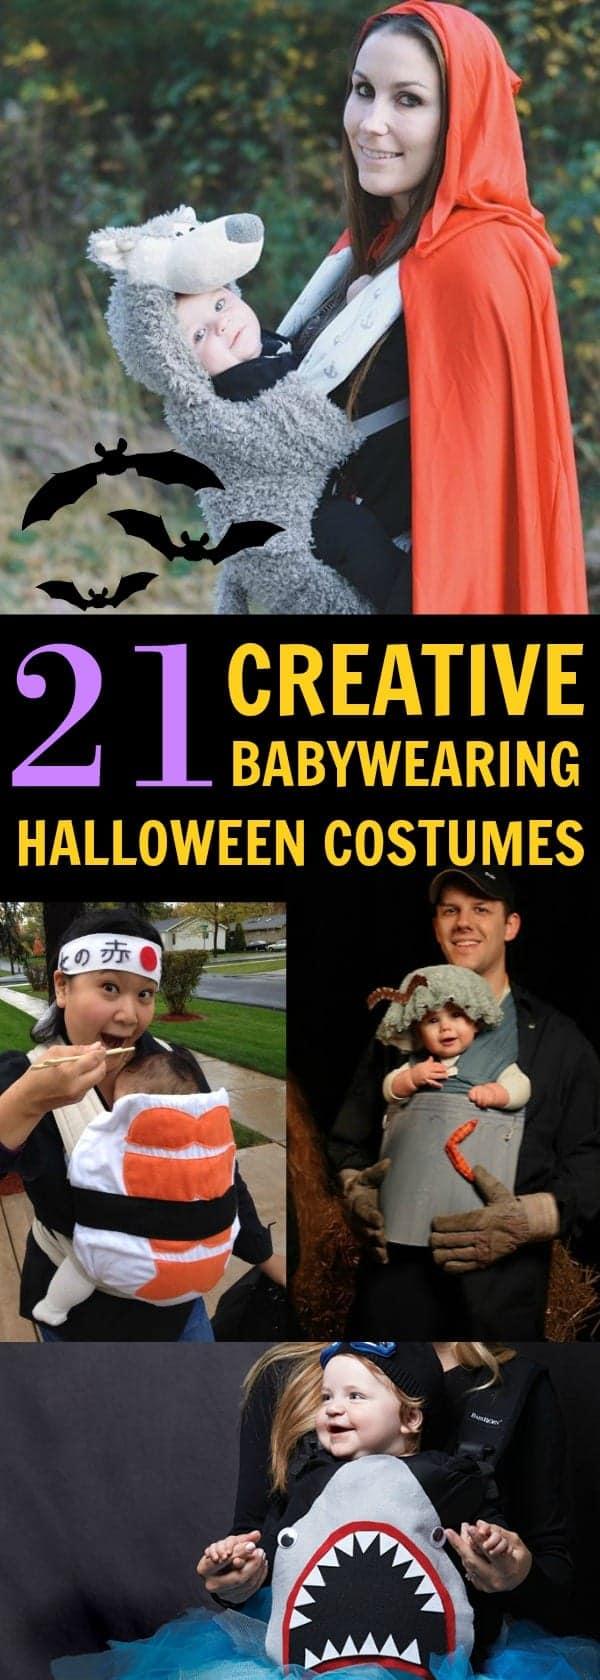 21 Creative Babywearing Halloween Costumes